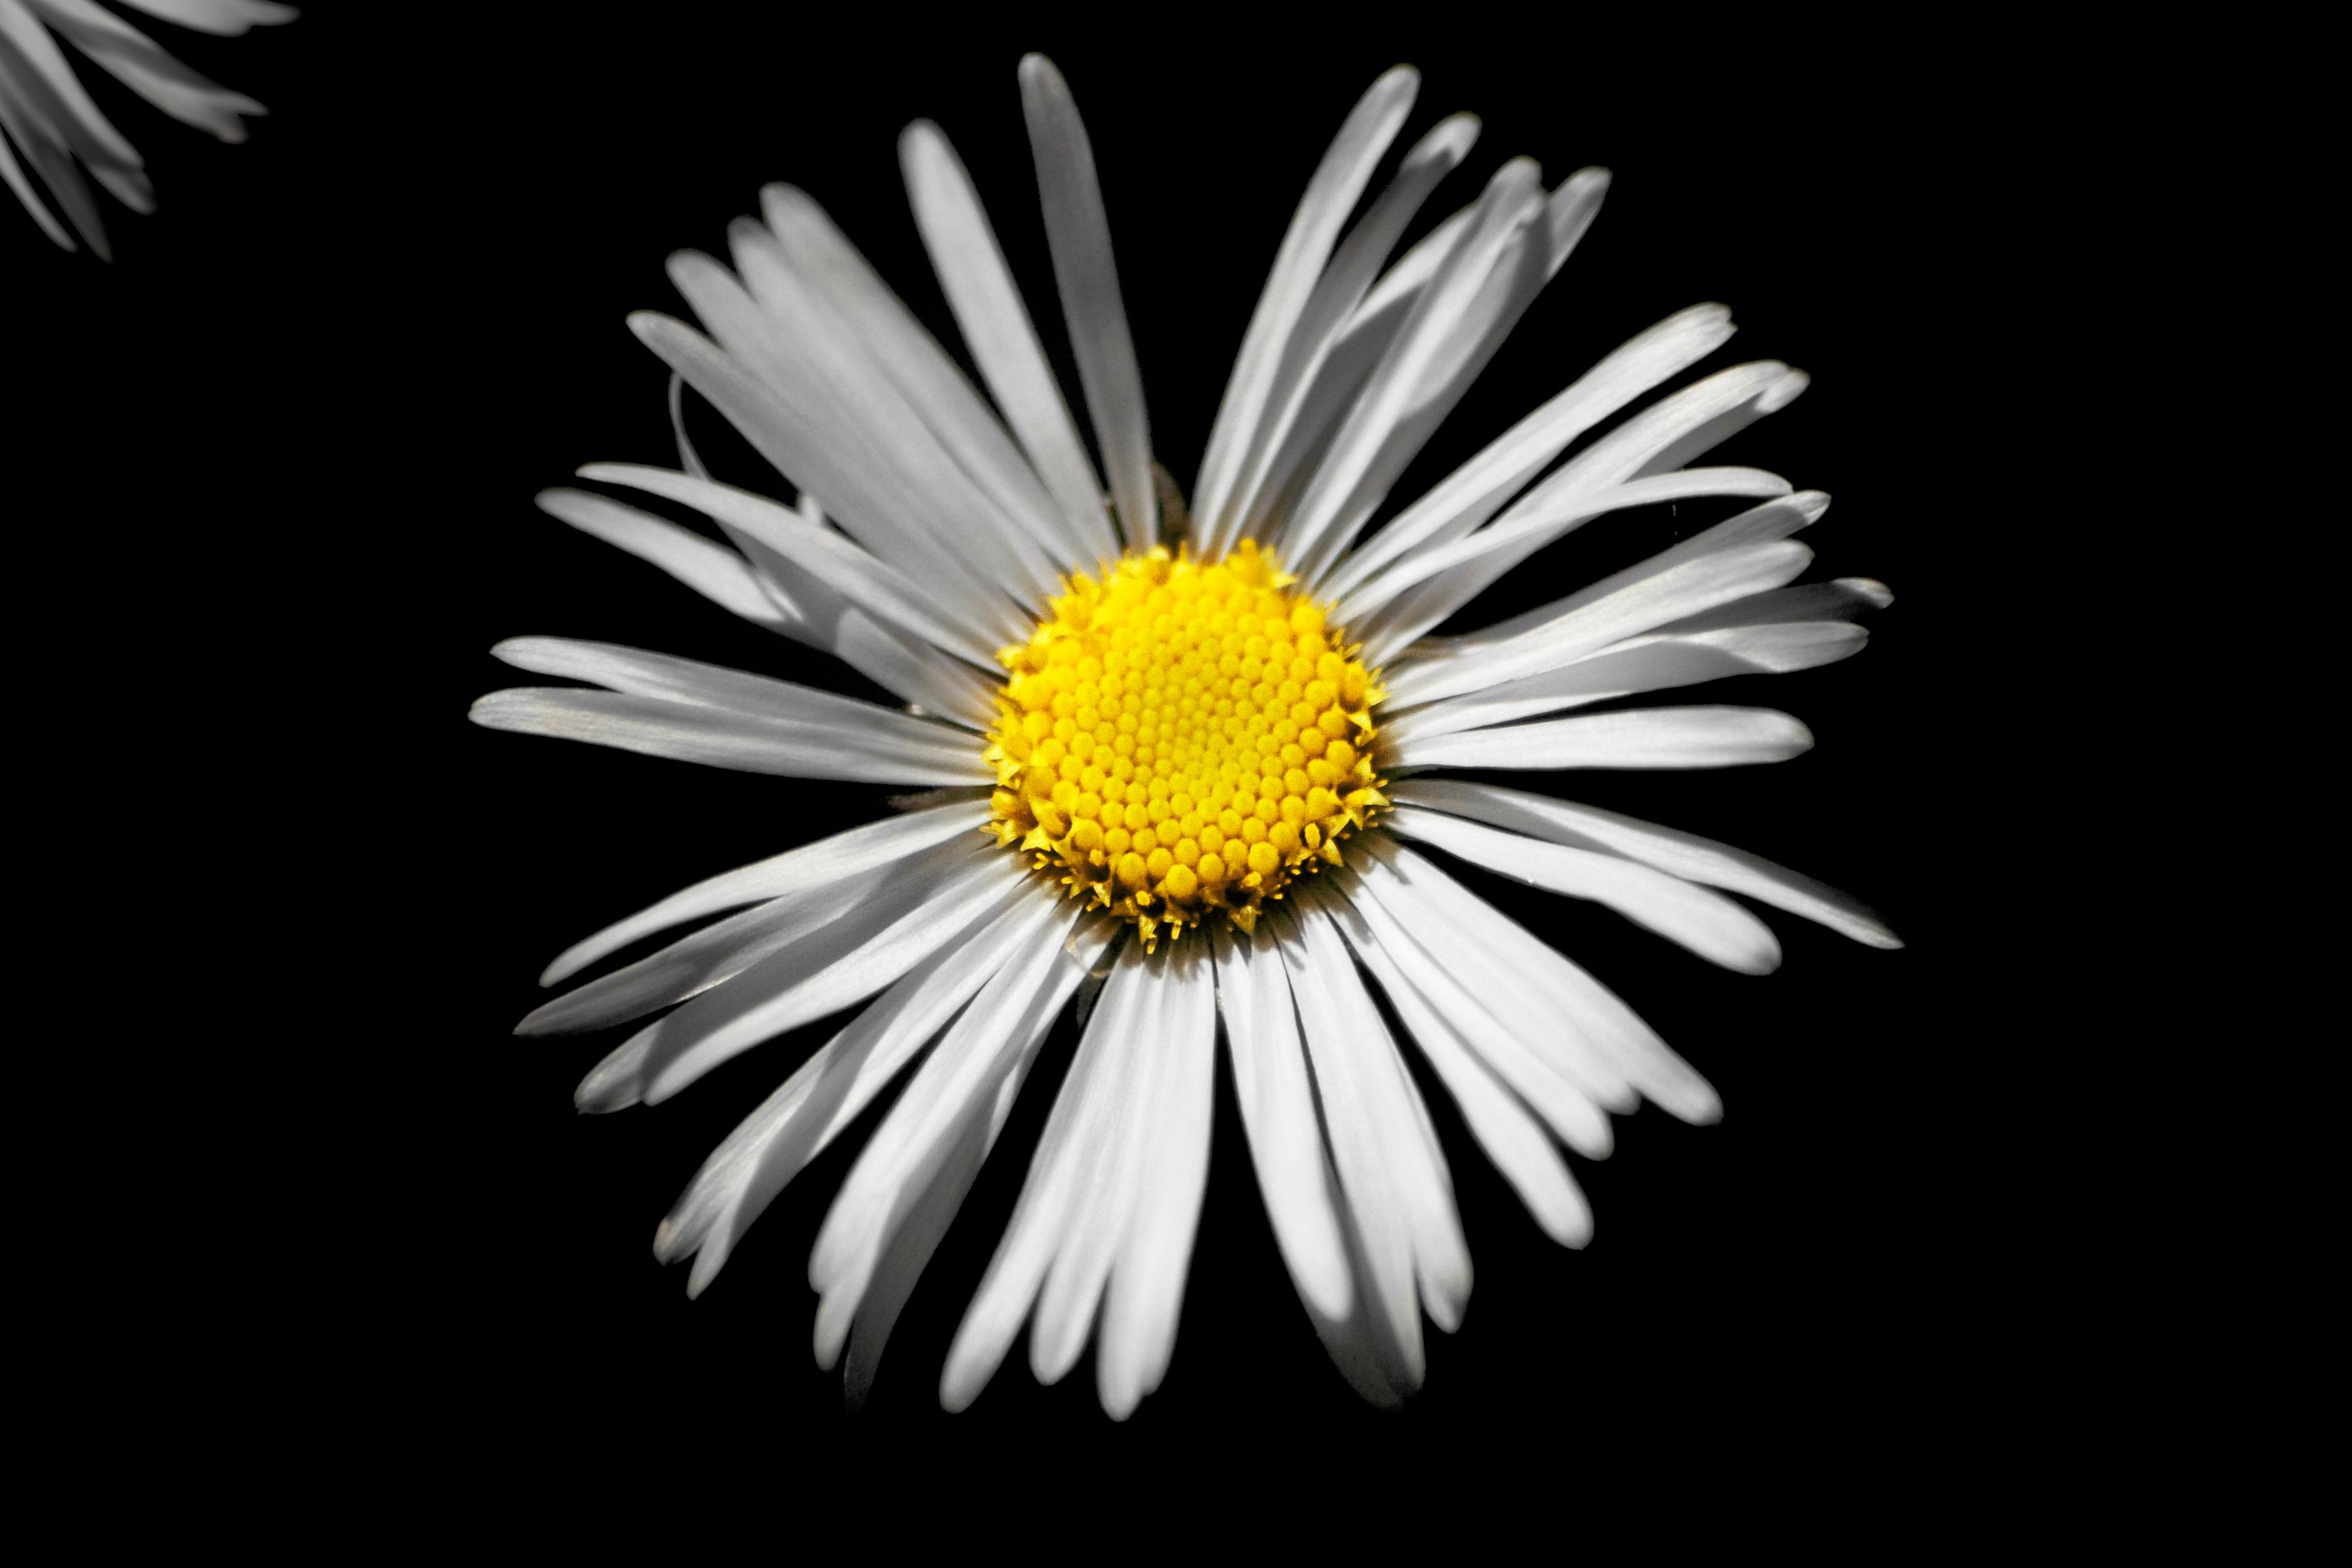 Sunflower on Black, Black, Closeup, Flower, Isolated, HQ Photo